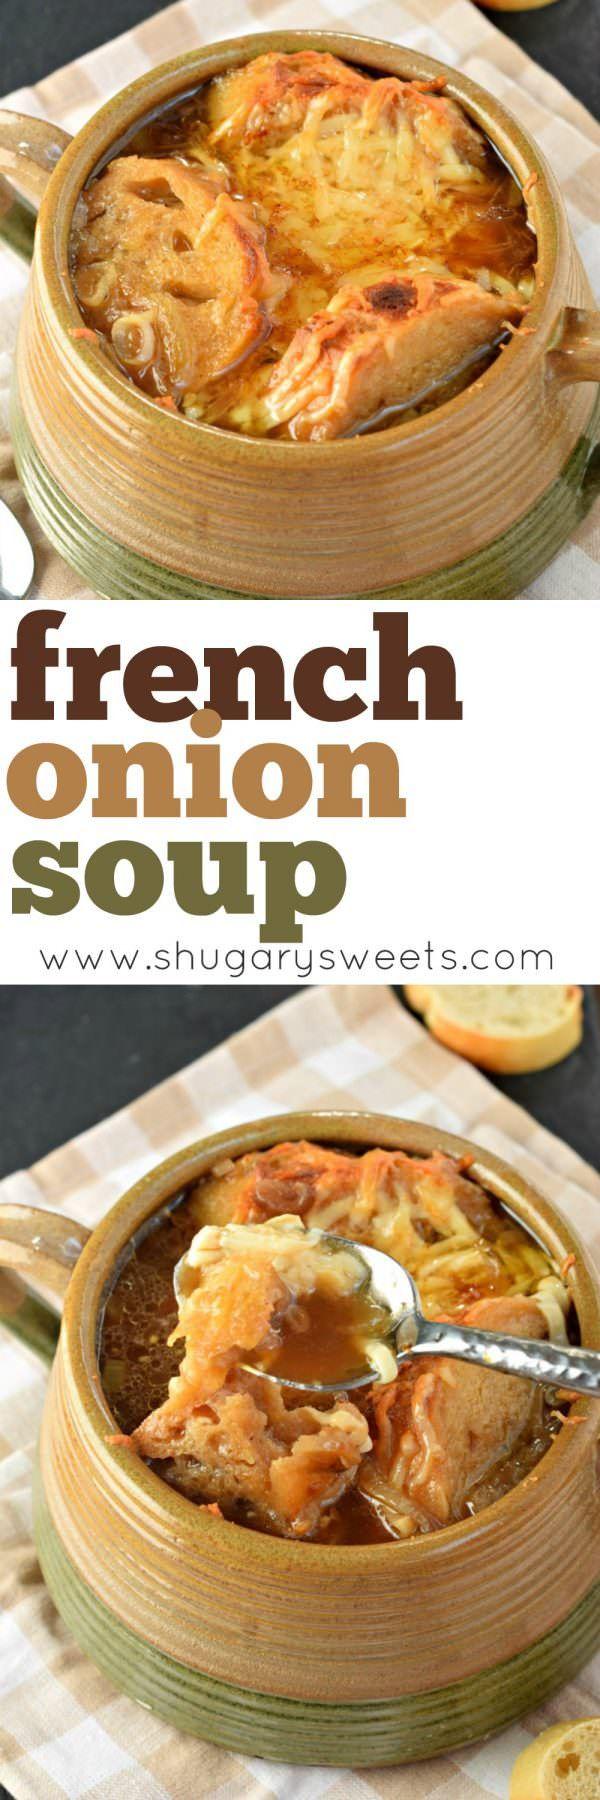 ... onion recipes caramelized onions onion soup recipes chili recipes best